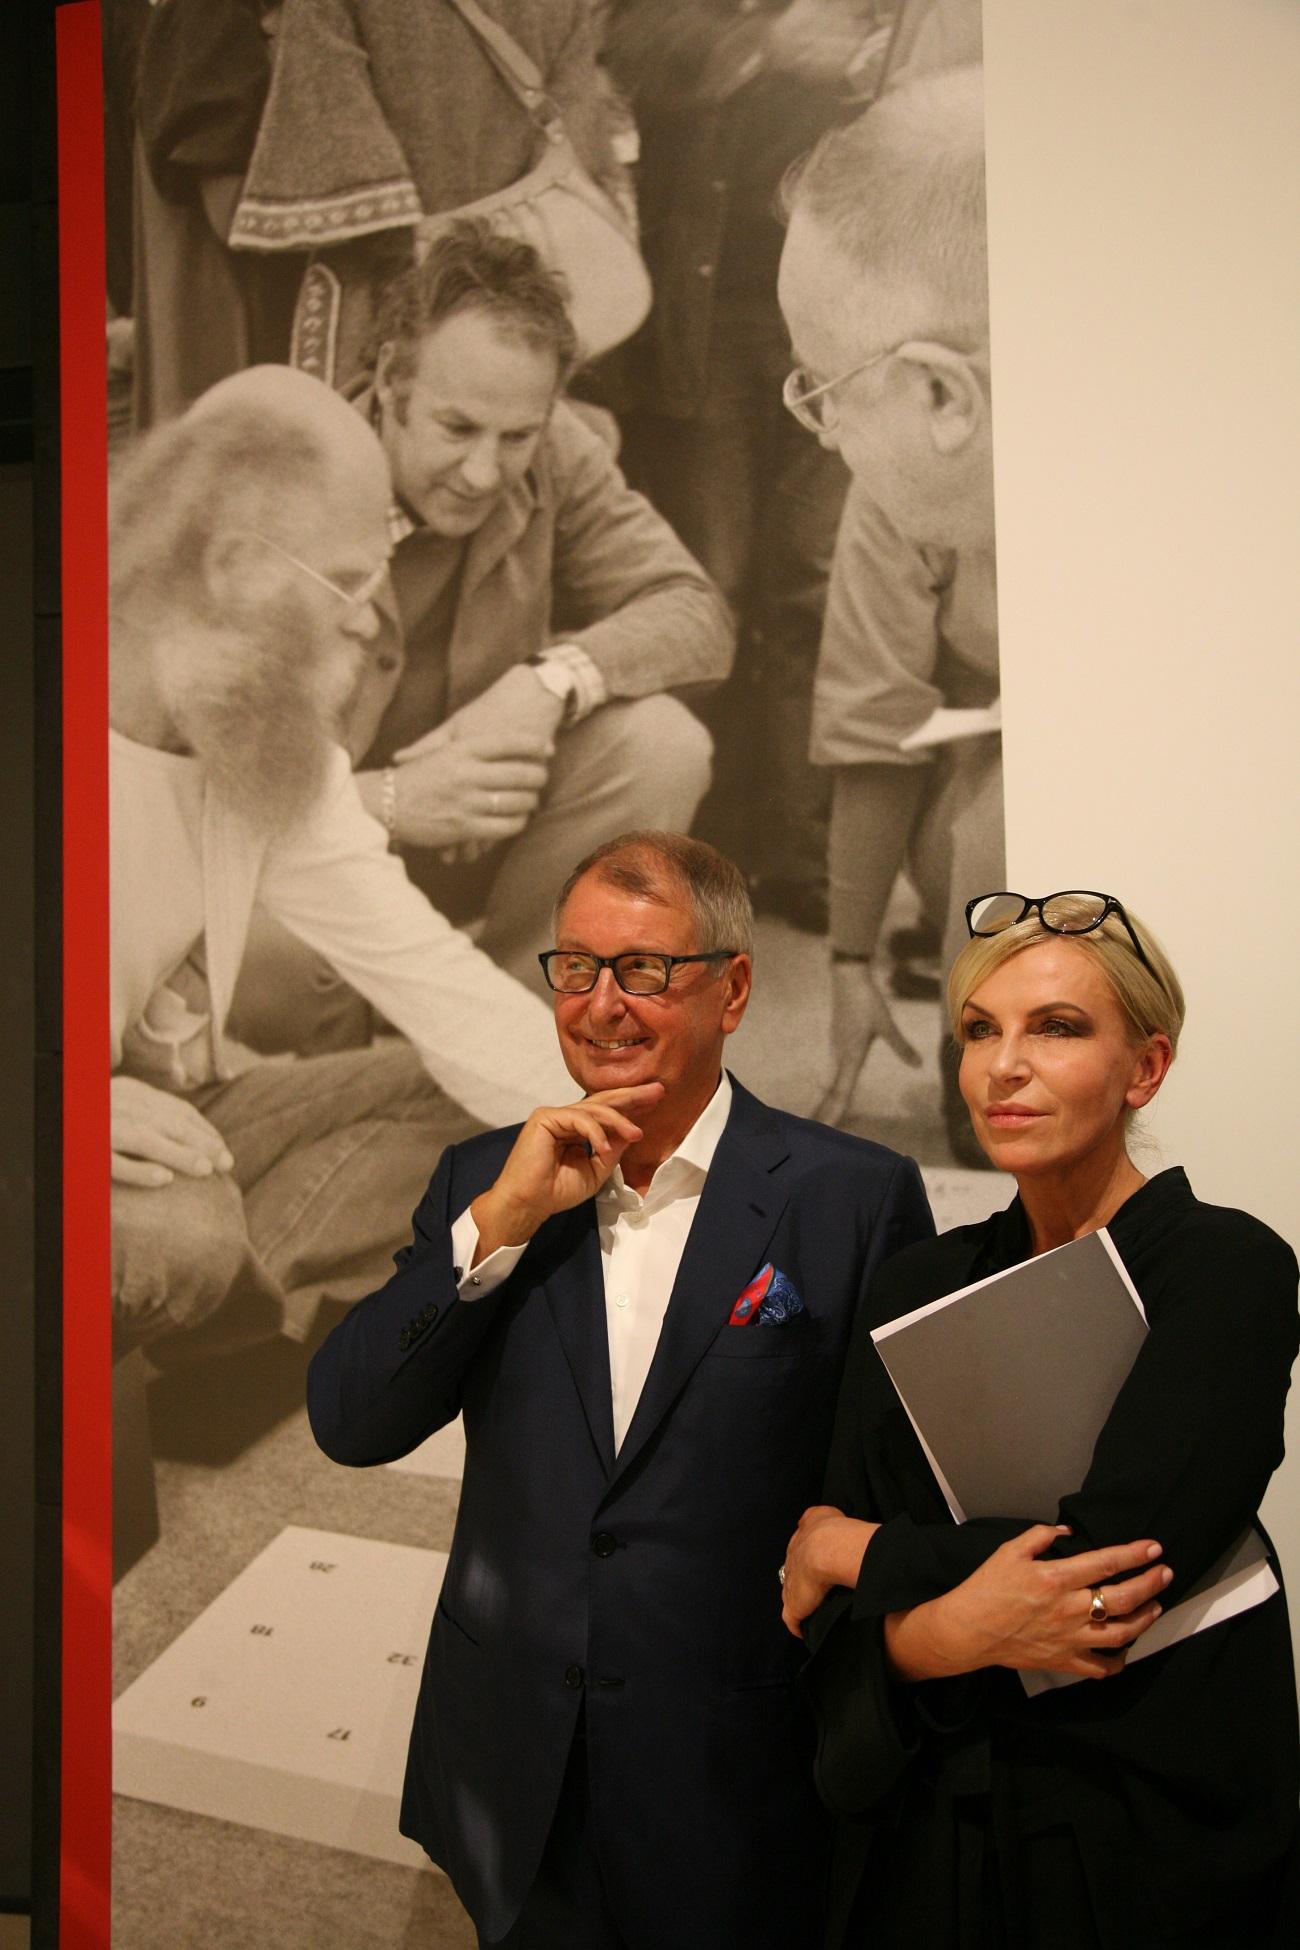 Jerzy Starak and Ania Muszyńska, Spectra Art Space curator, at the opening of Ryszard Winiarski exhibition in Warsaw. Courtesy of Starak Family Foundation.